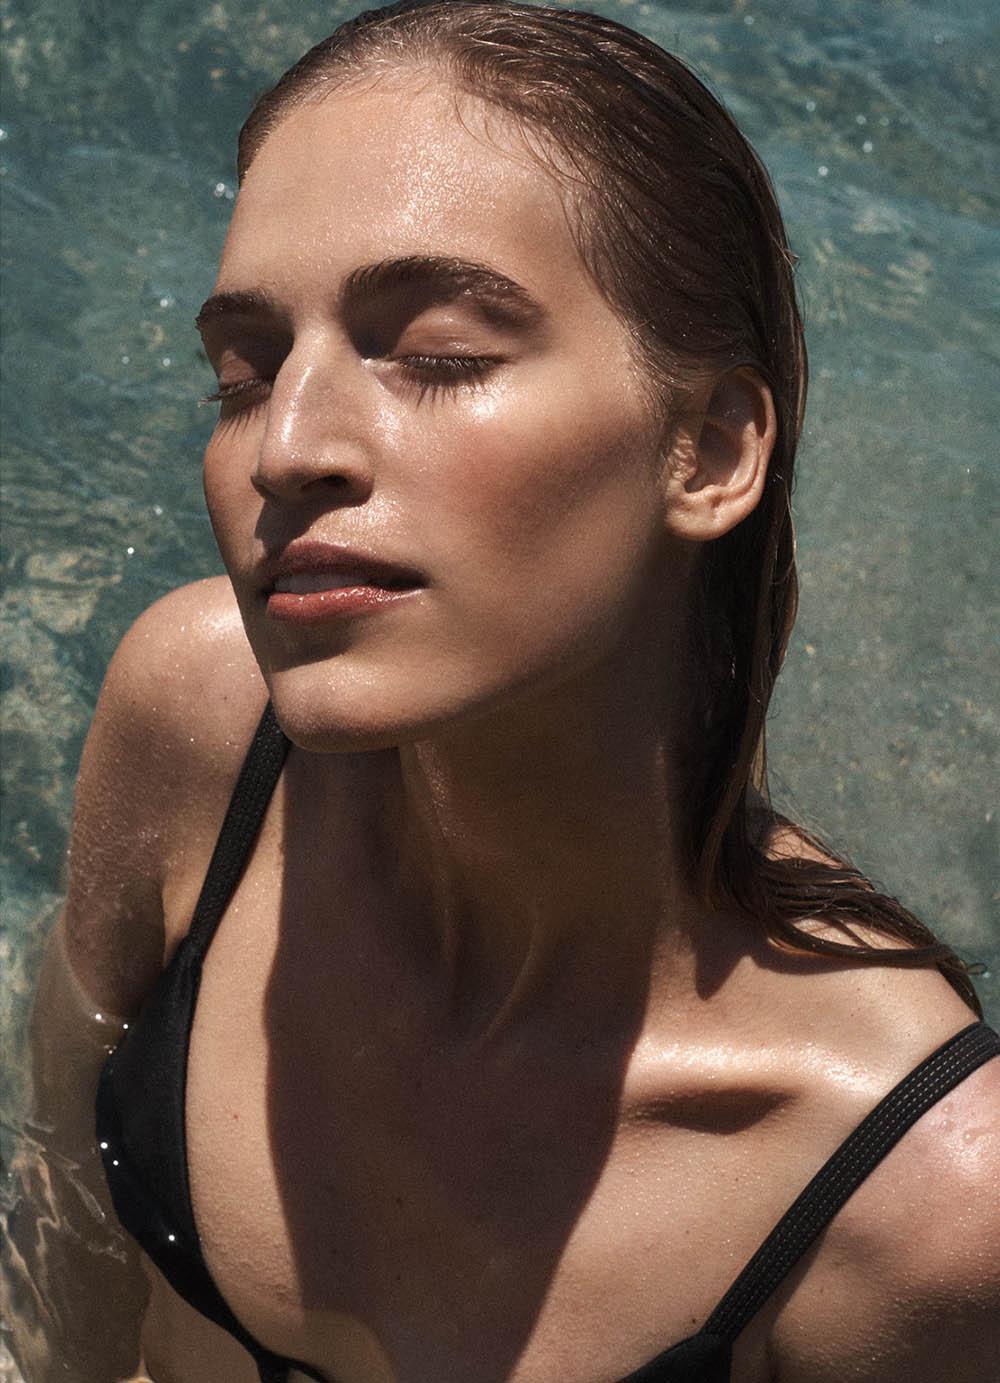 Vanessa Axente by Benny Horne for Porter Magazine Summer Escape 2018